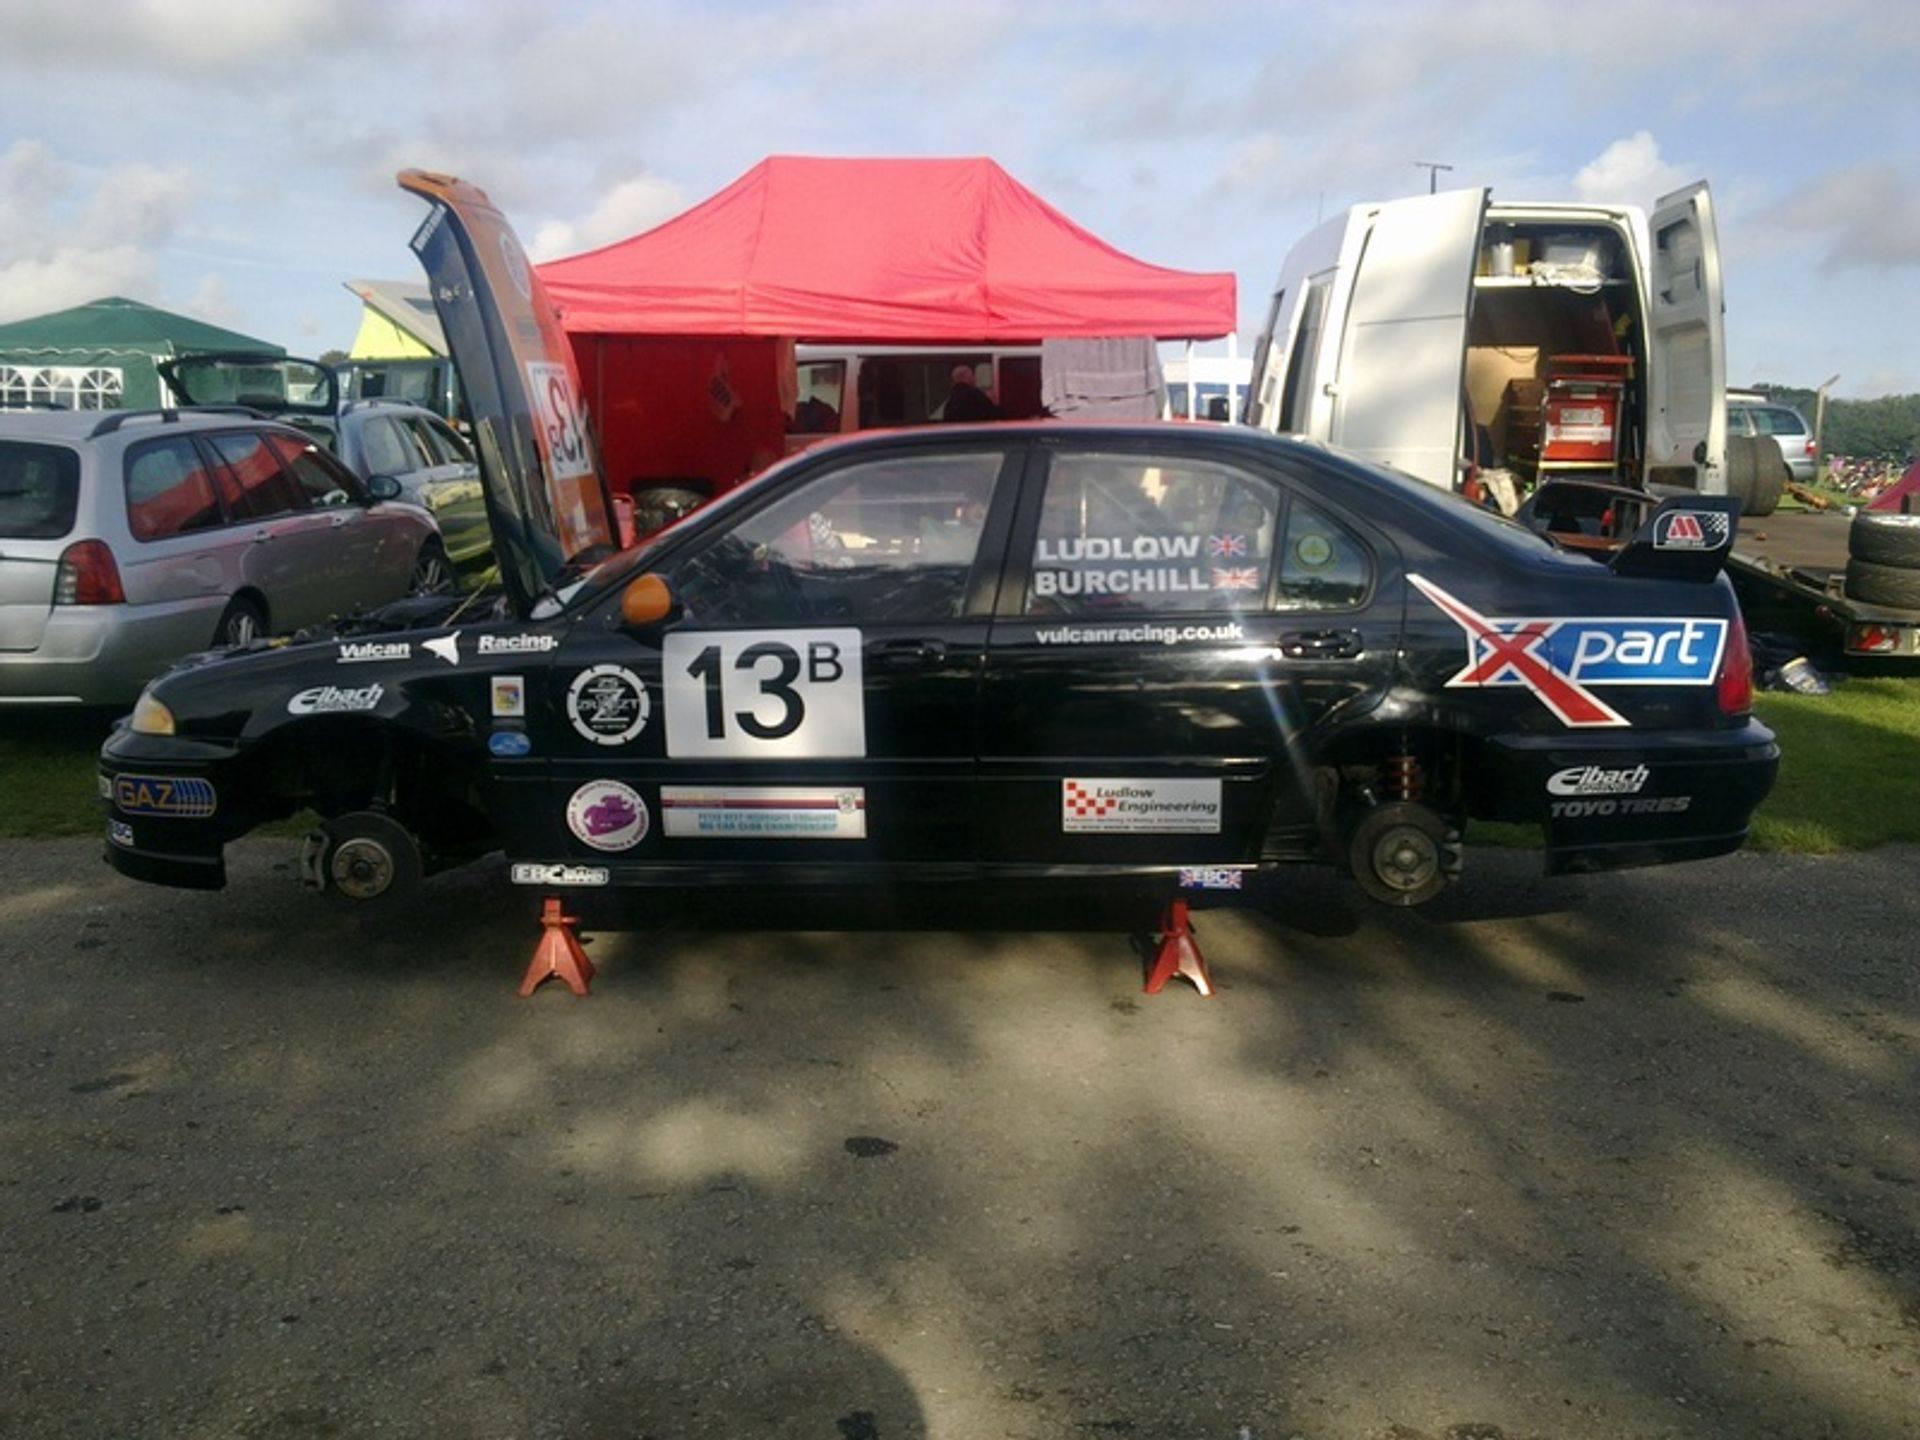 2010 Champions MGZS V6 Vulcan Racing Peter Burchill & Dan Luldow MGCC